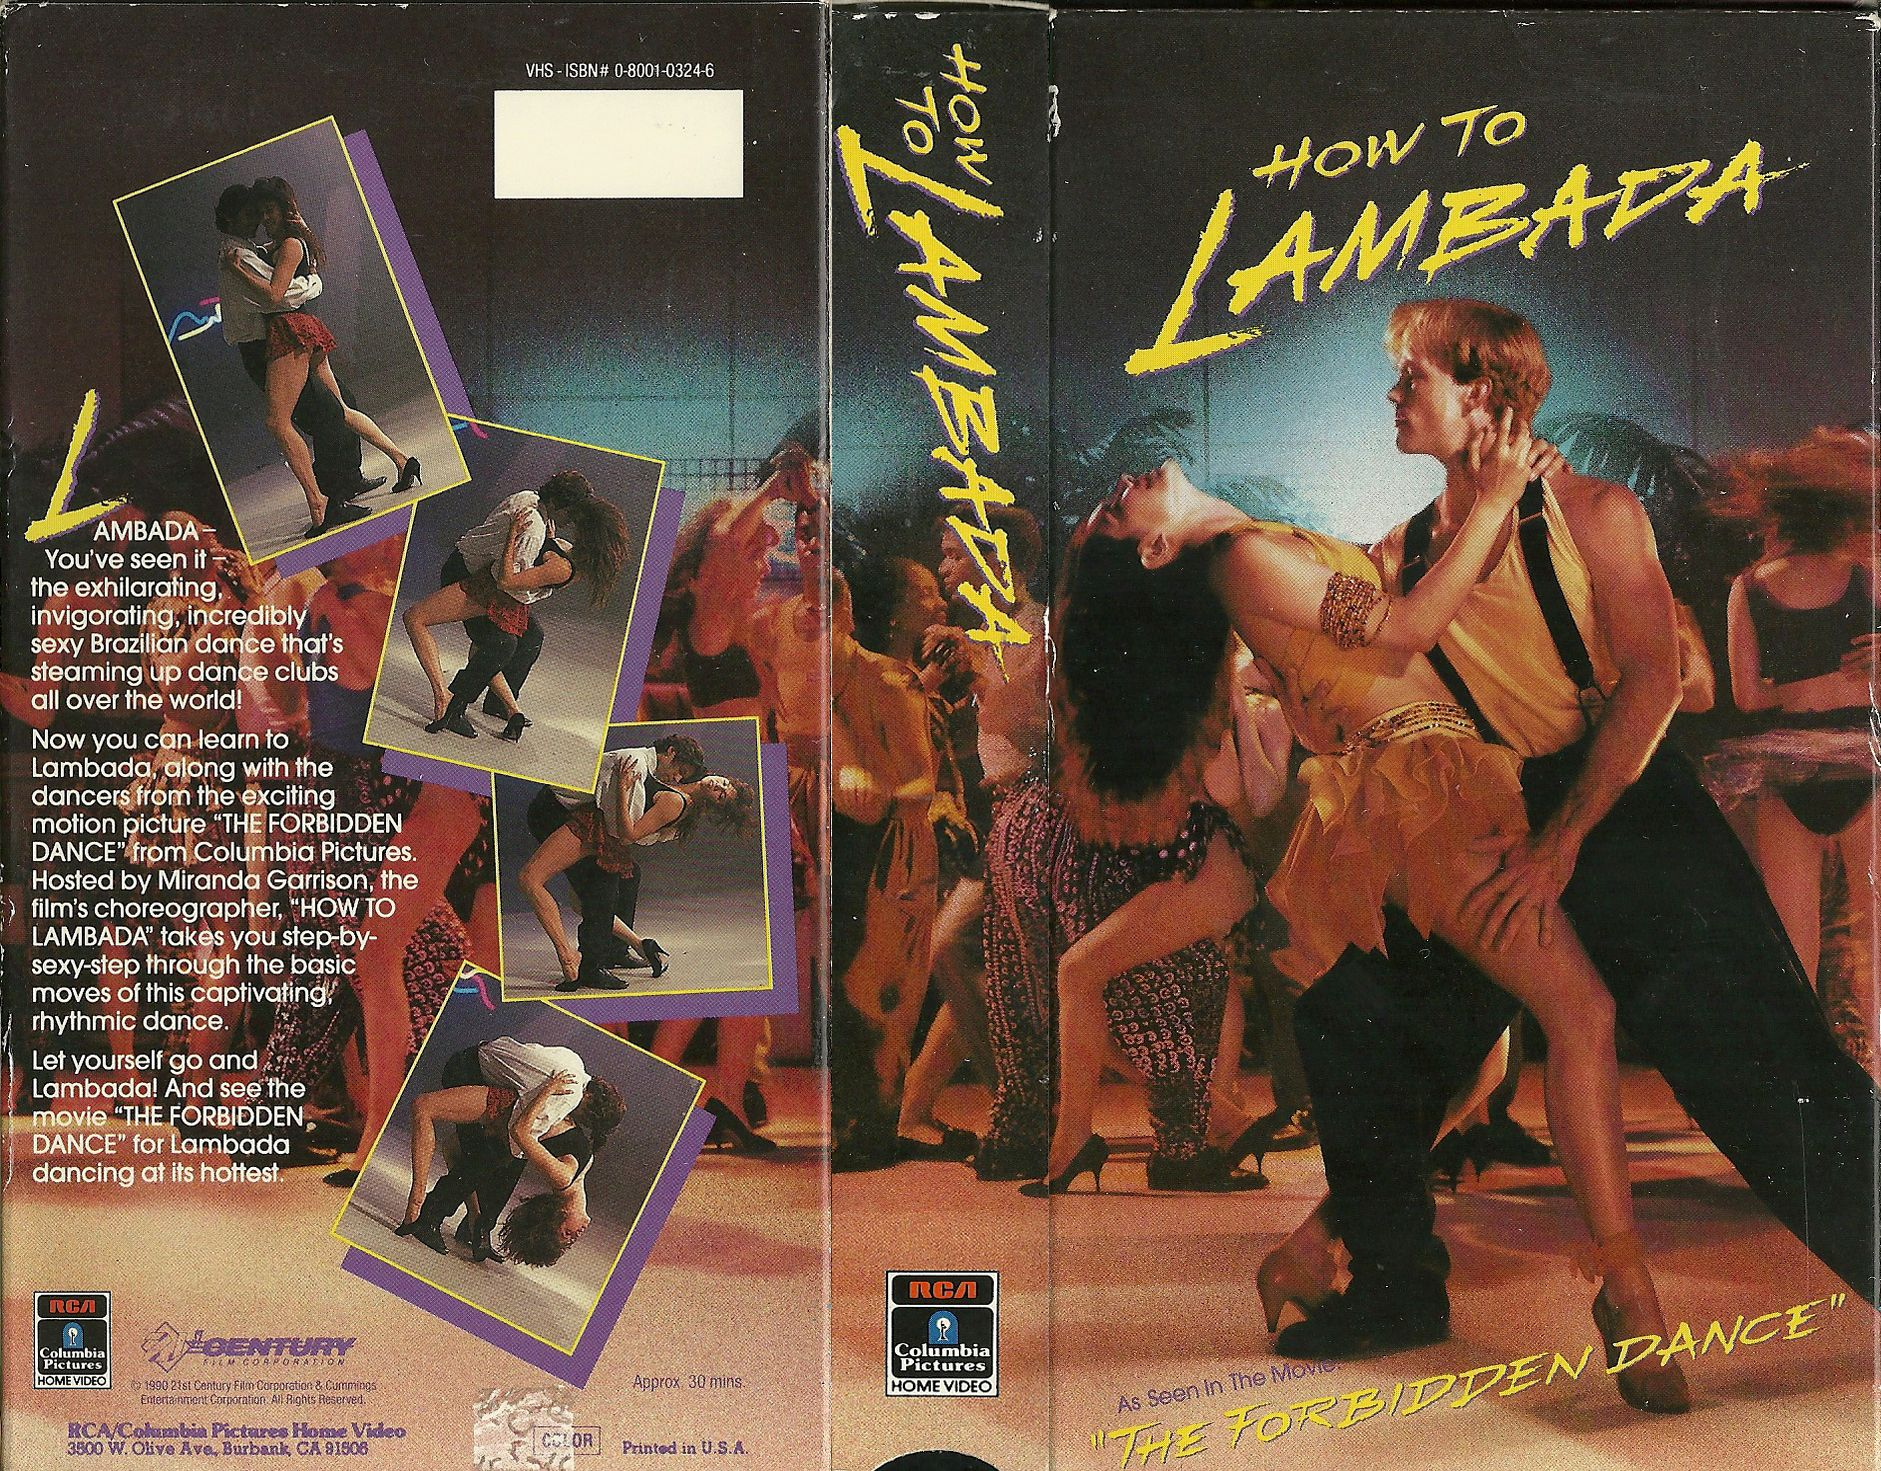 The Forbidden Dance Is Lambada  The Forbidden Dance Images